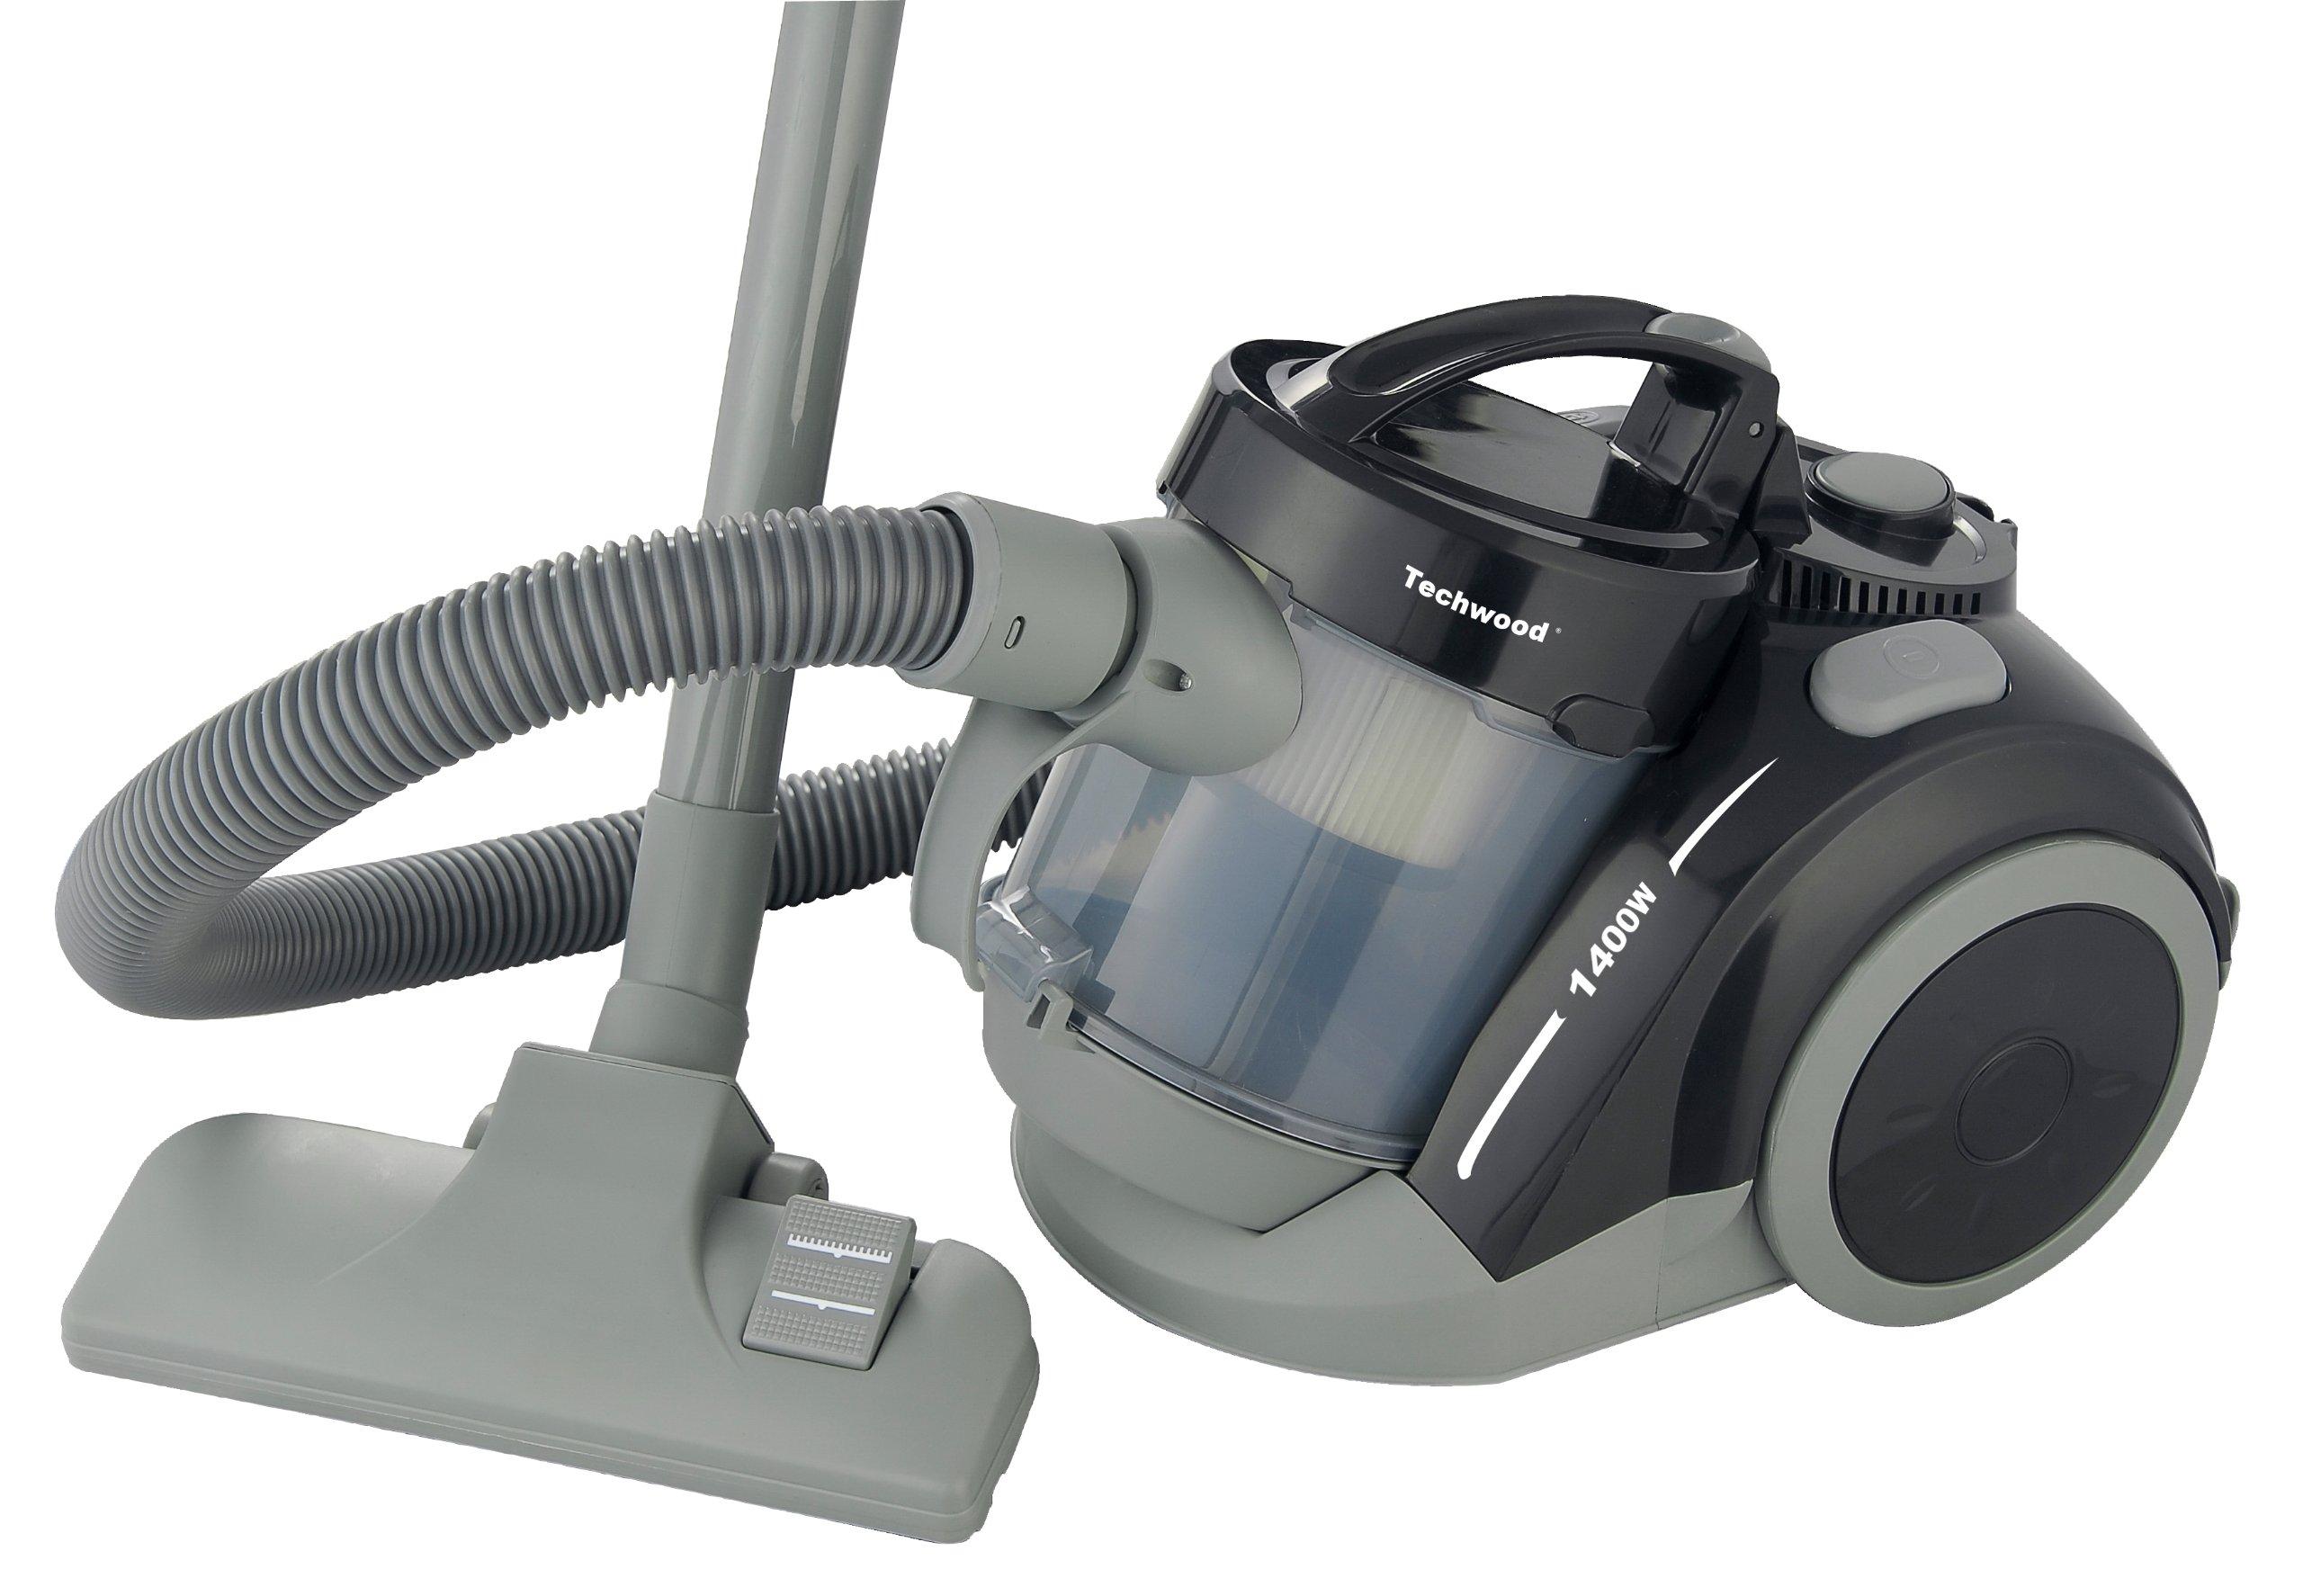 Techwood tas-85 – Aspiradora sin bolsa (1400 W): Amazon.es: Hogar